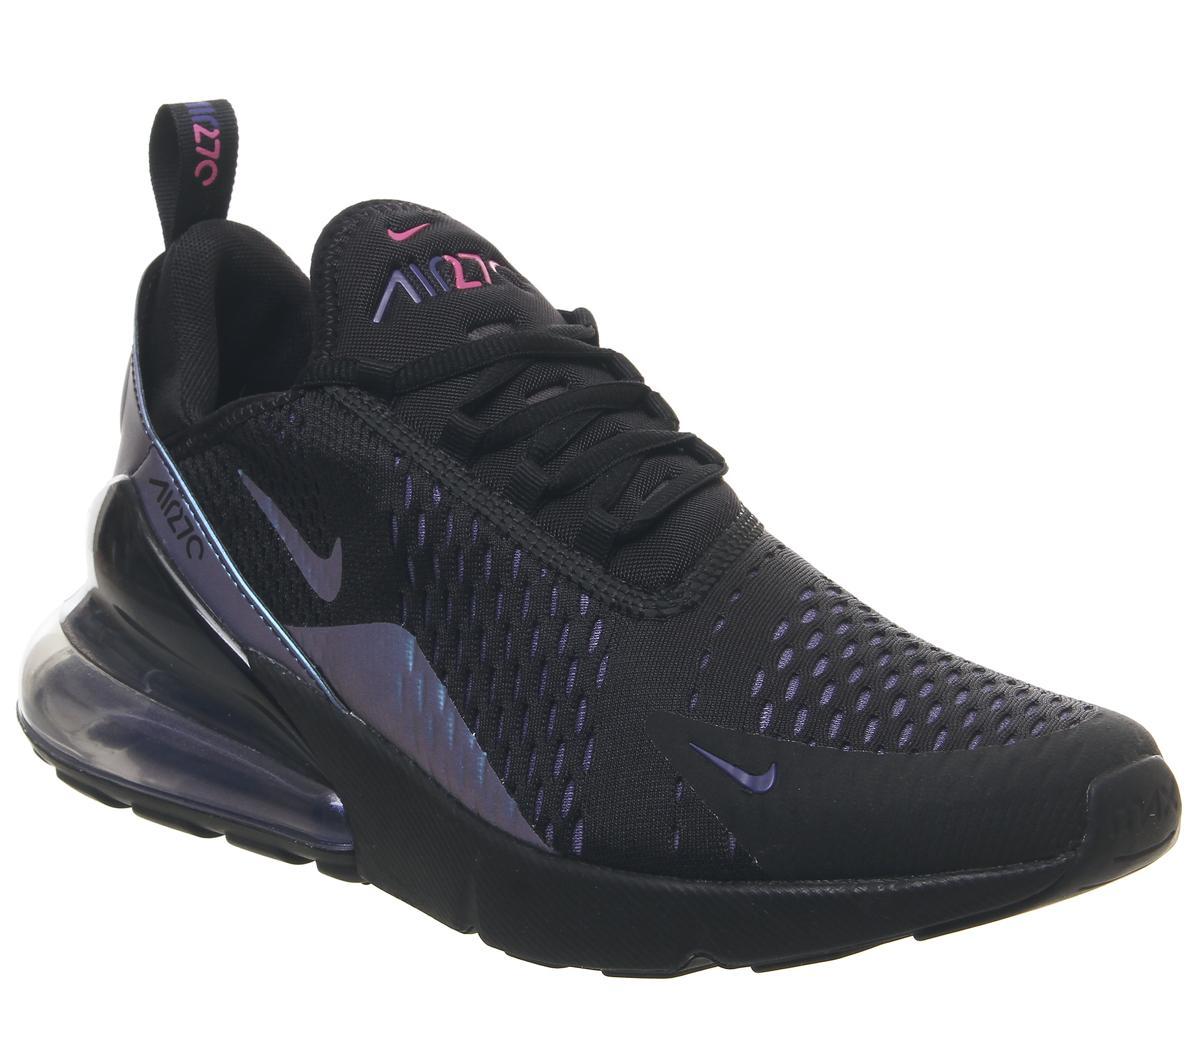 nike air 270 purple and black